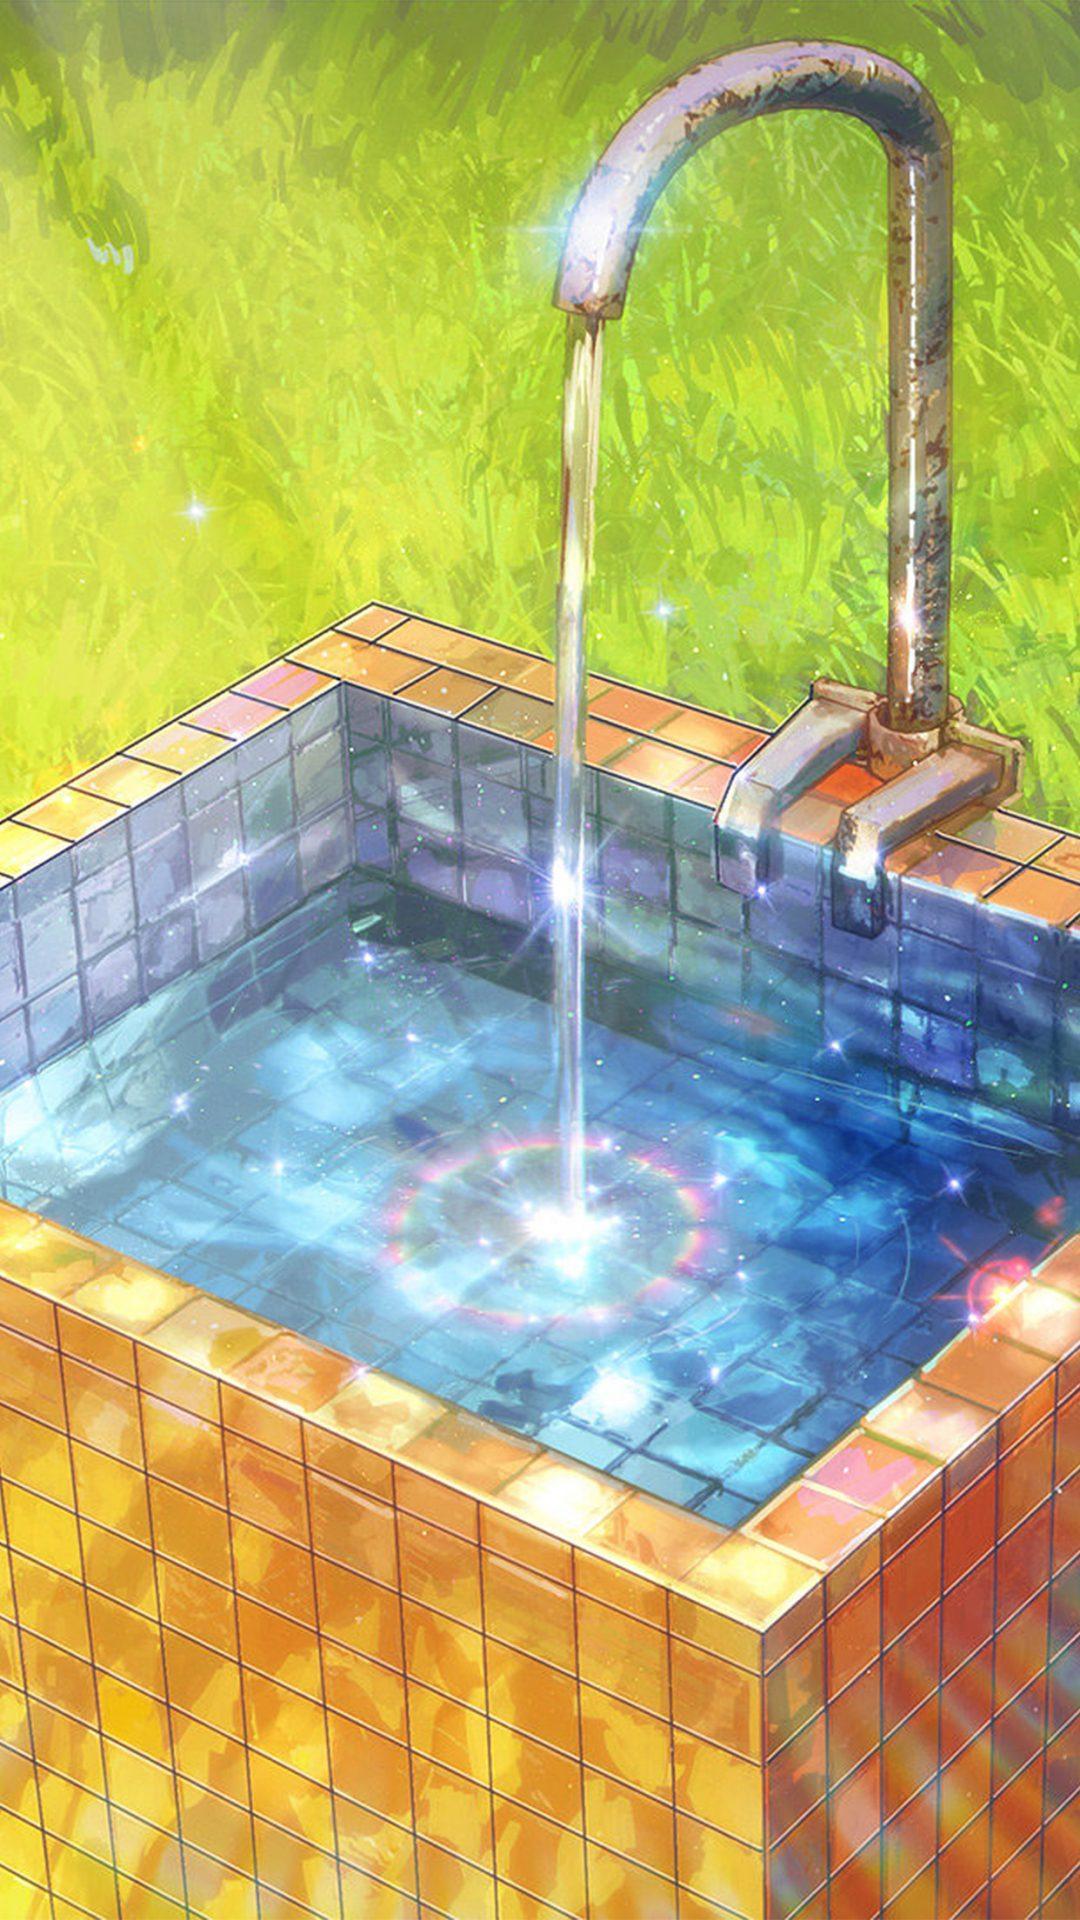 Water Anime Paint Color Illustration Art Arseniy Chebynkin